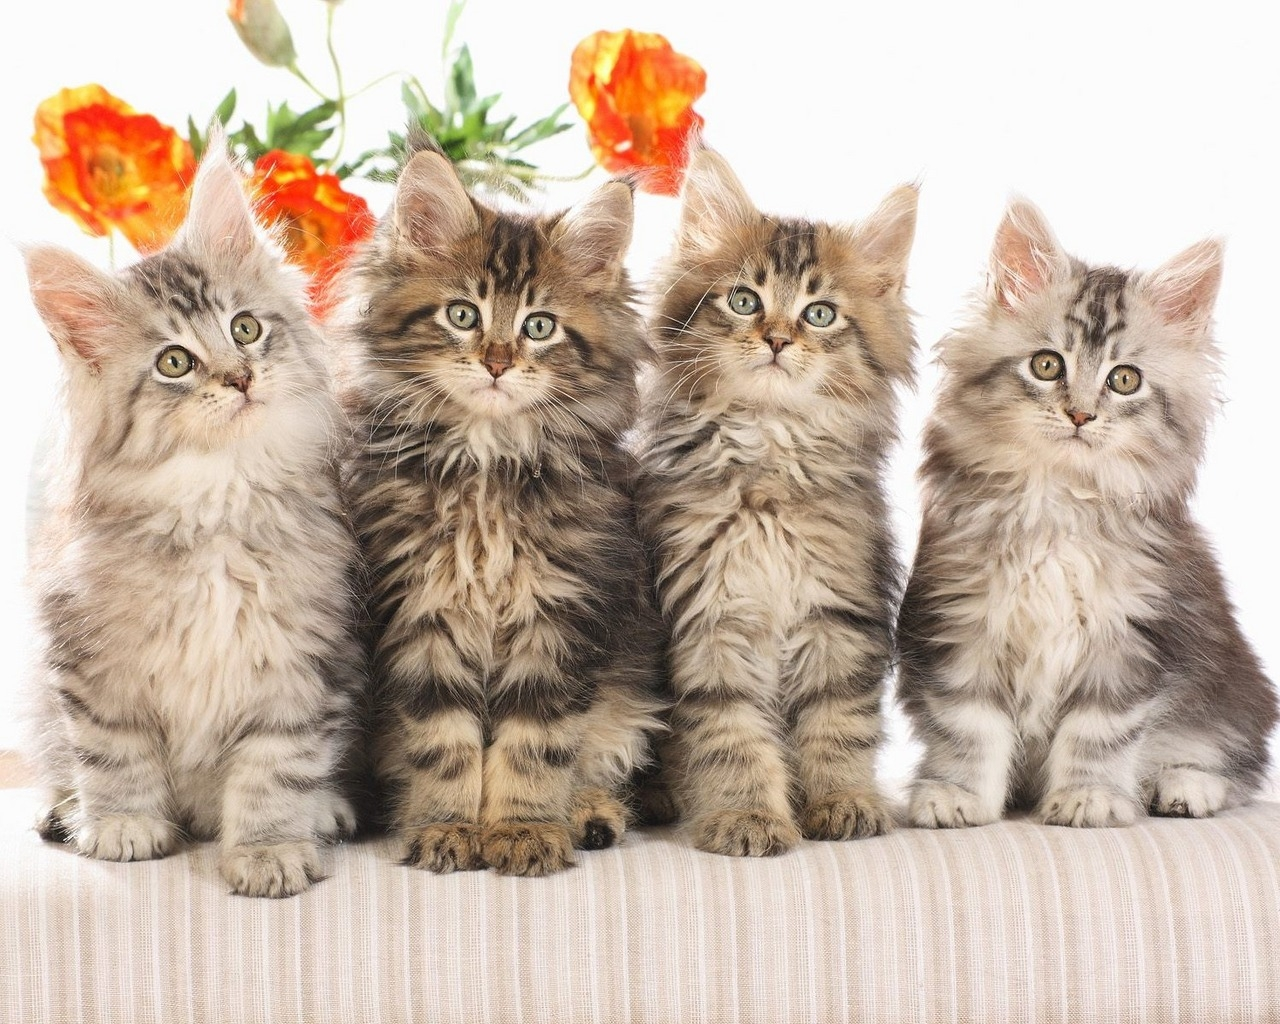 Cat   Wallpapers Pictures Pics Photos Images Desktop Backgrounds 1280x1024